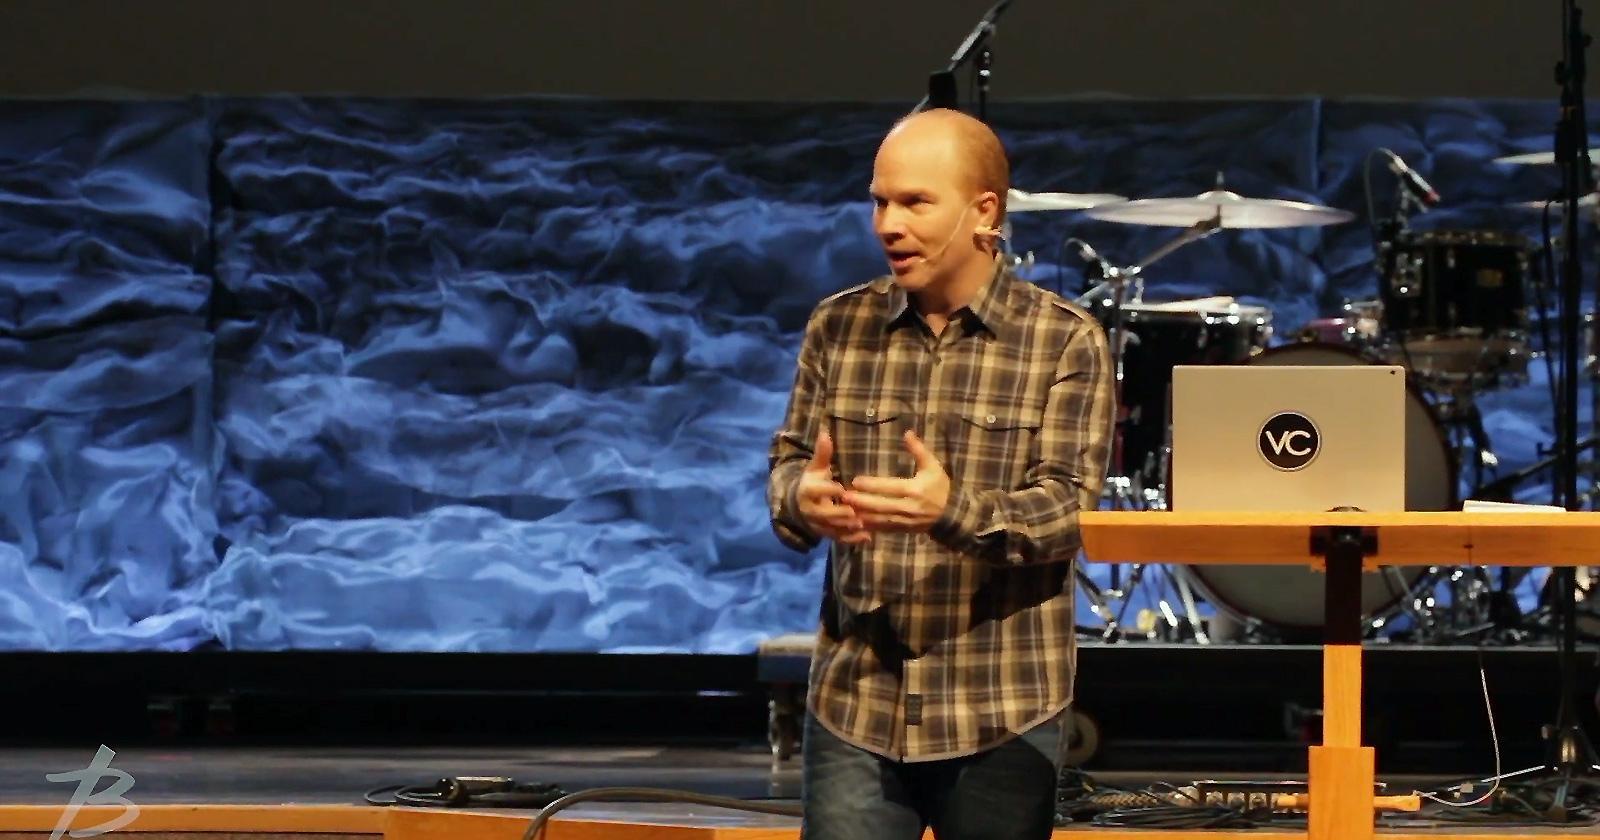 Dan Goddard, pastor from Dan Godard from Victory Church in Moose Jaw